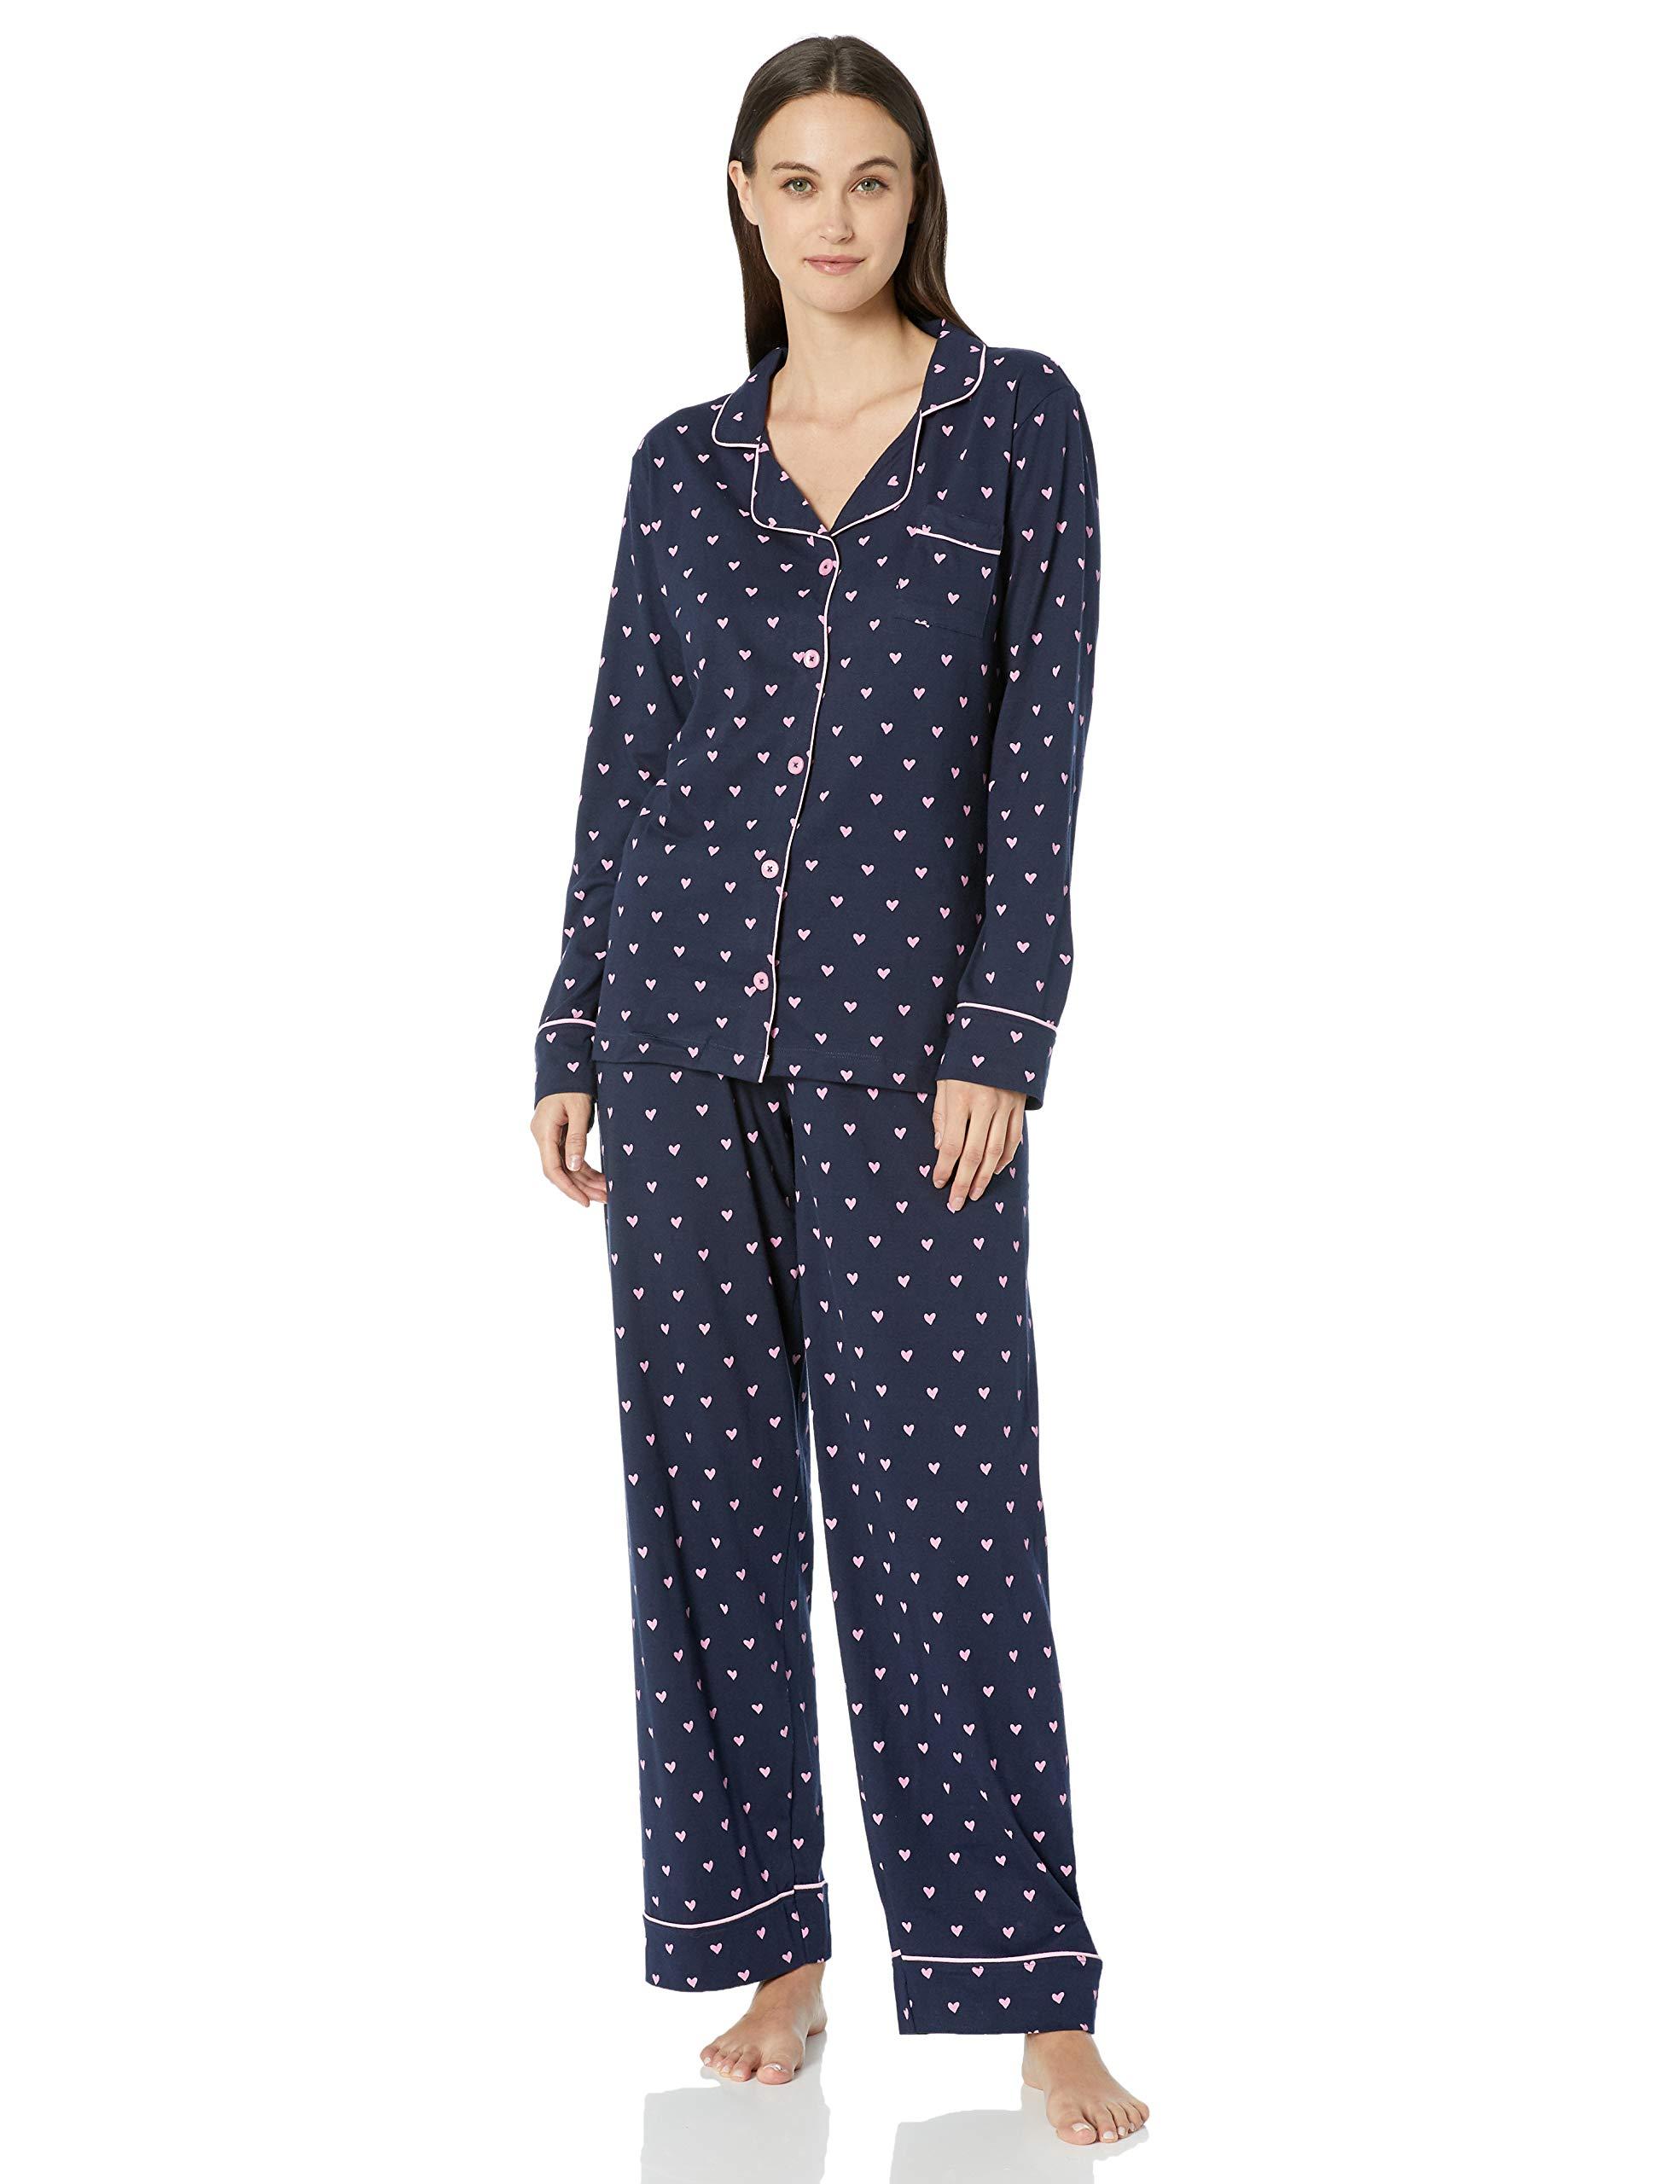 Long Sleeve Sets De Femme Blue Ensemble Hatley Little PyjamaBleupink House 400Medium Pajama Hearts By b7fyY6gv